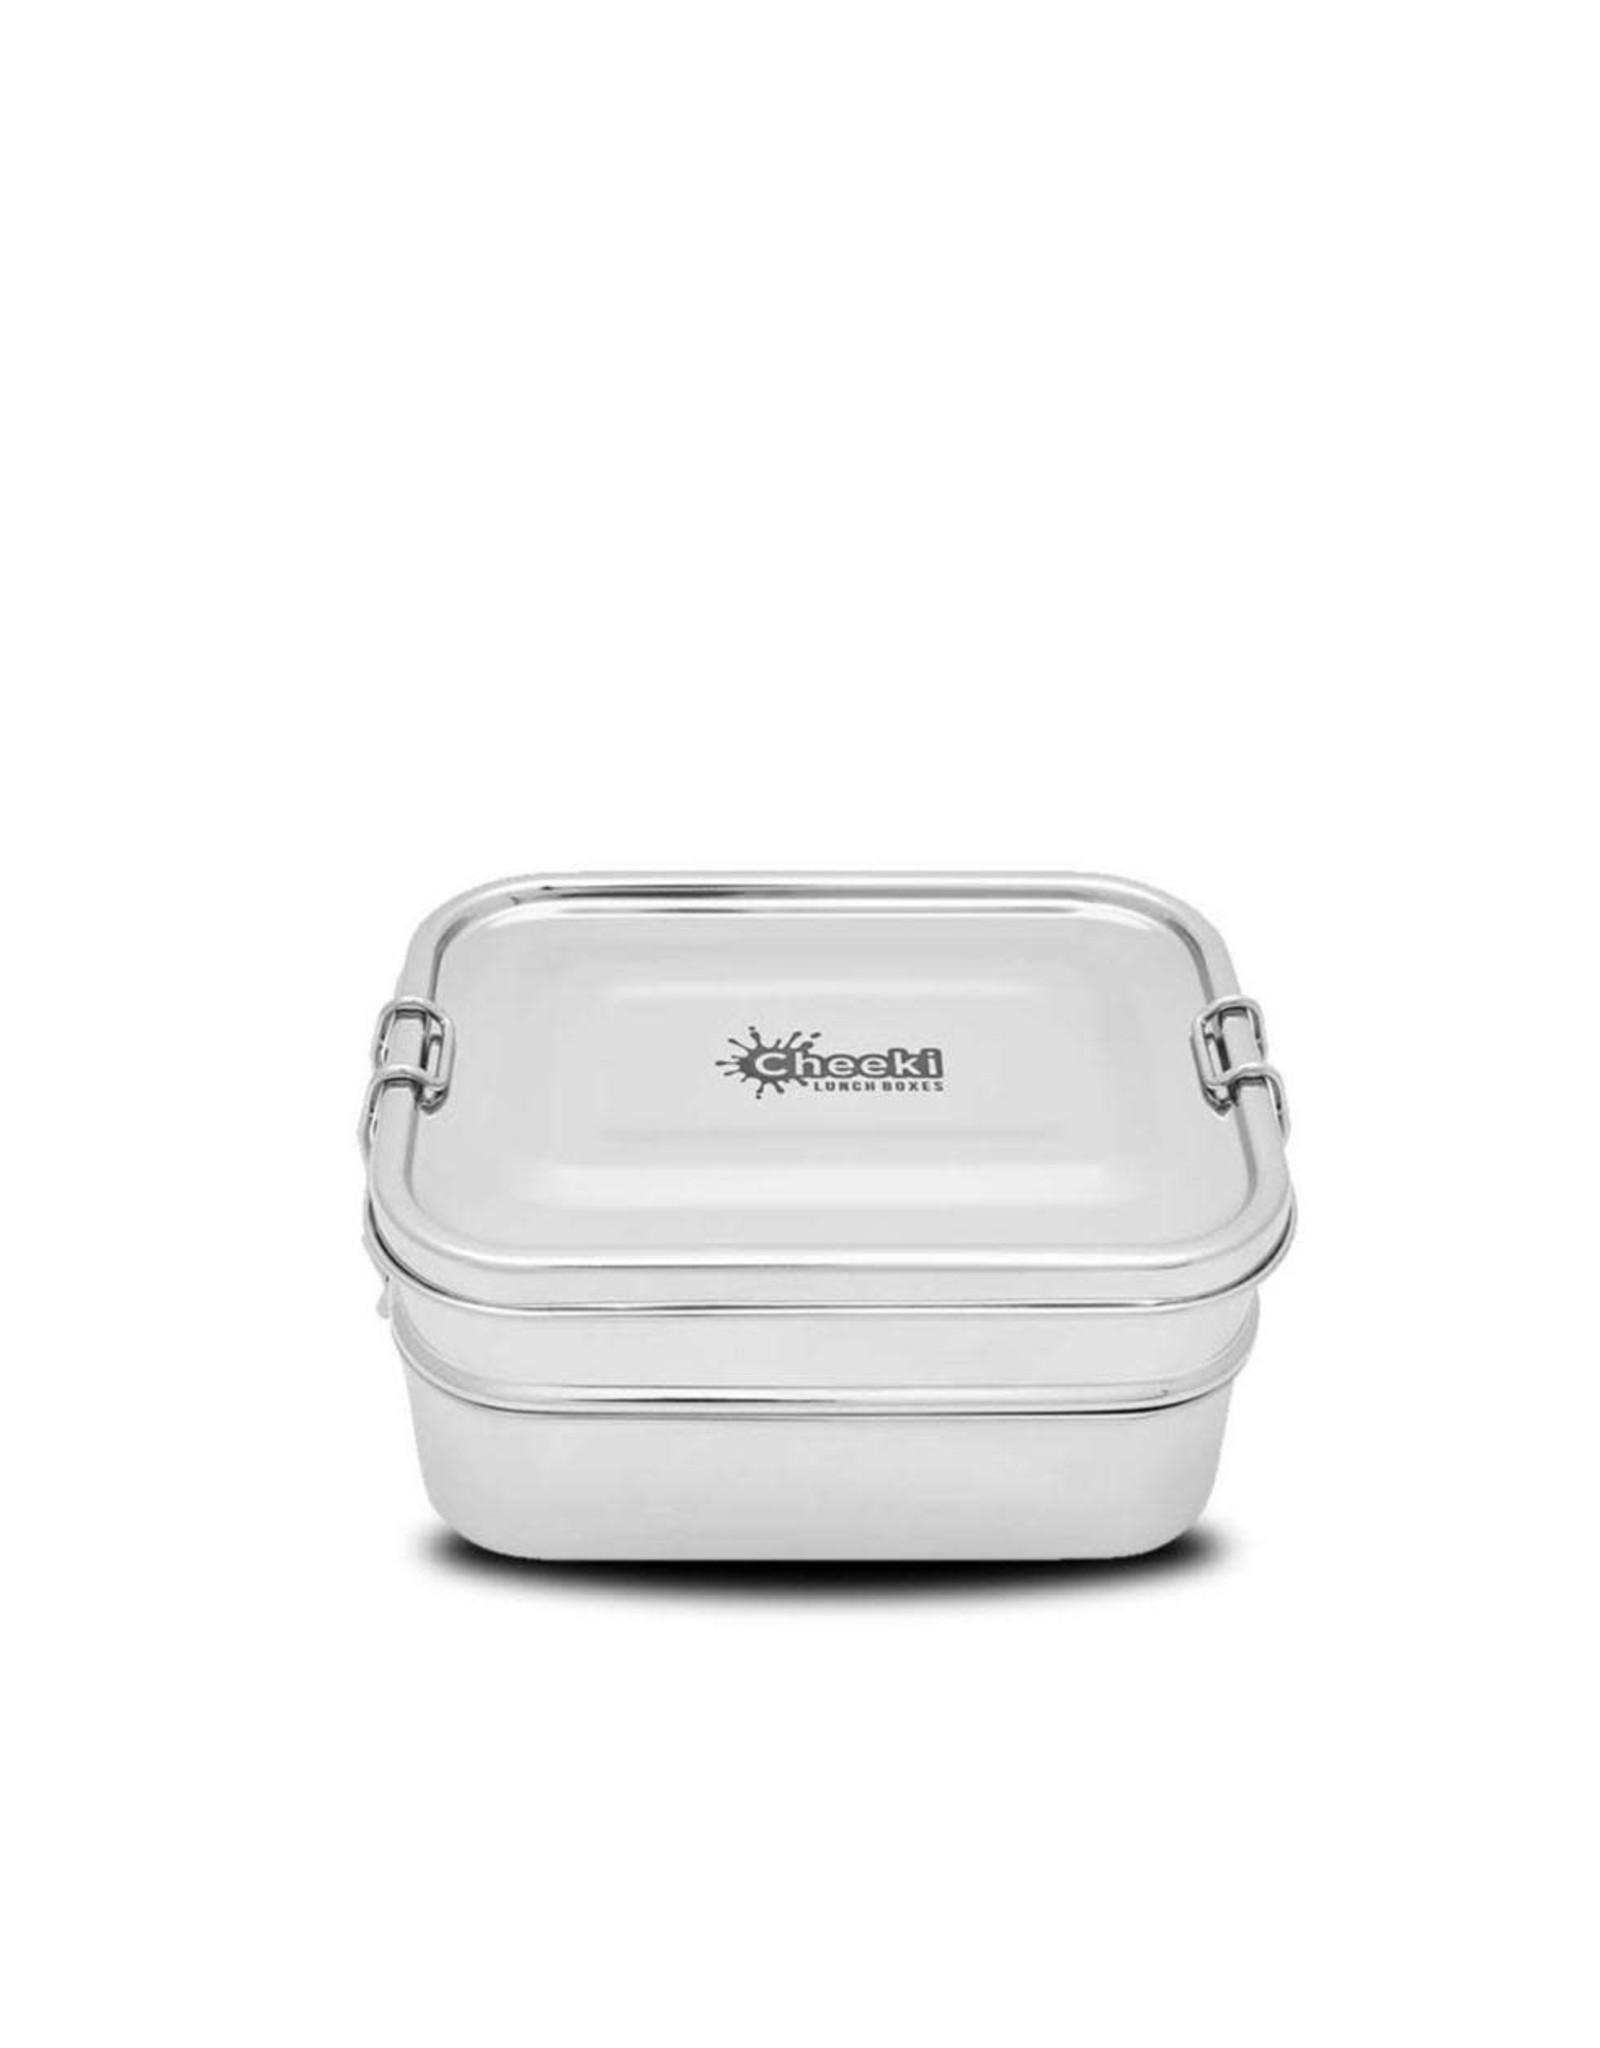 Cheeki Lunch Box Double Stack 1L